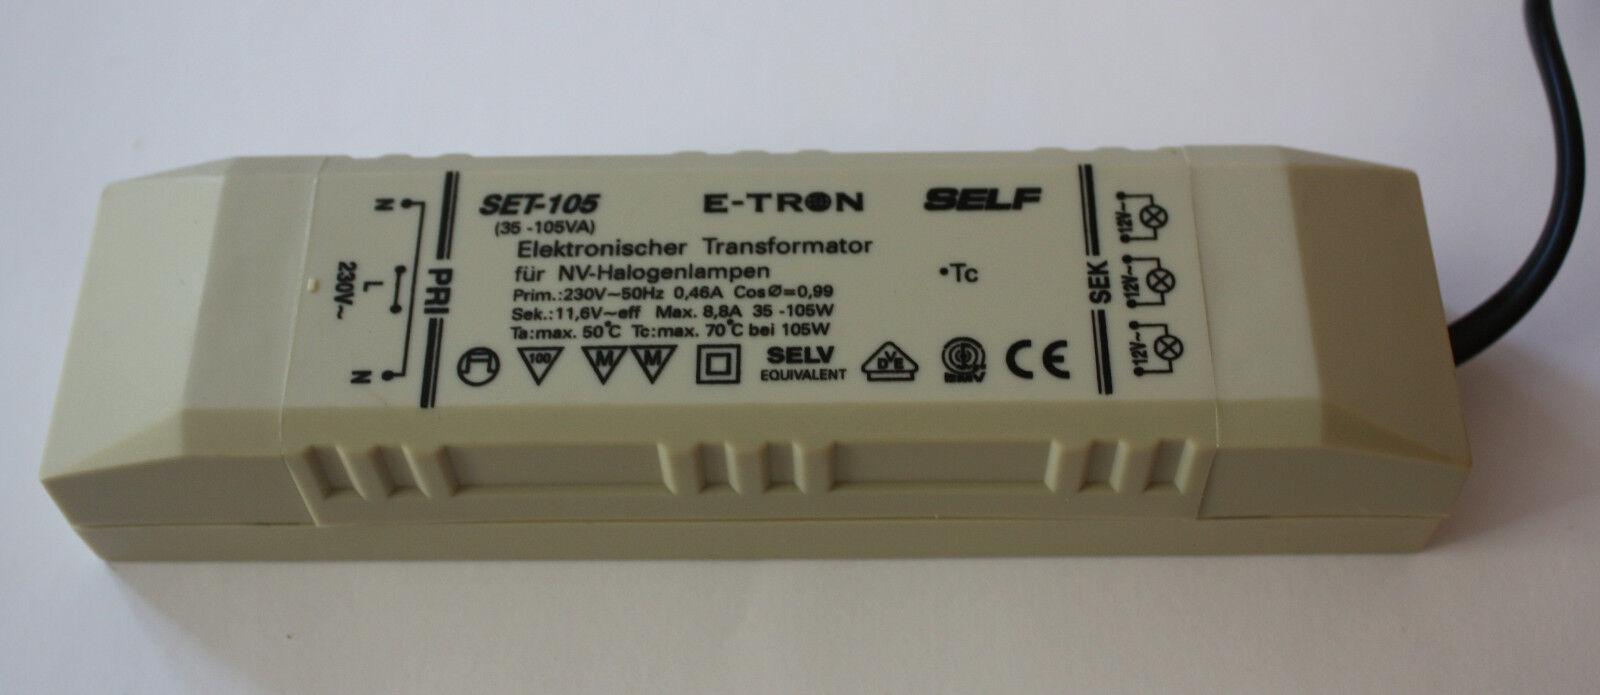 Halogen Trafo 105W 150W 12V AC Elektronischer Halogentrafo Transformator Treiber